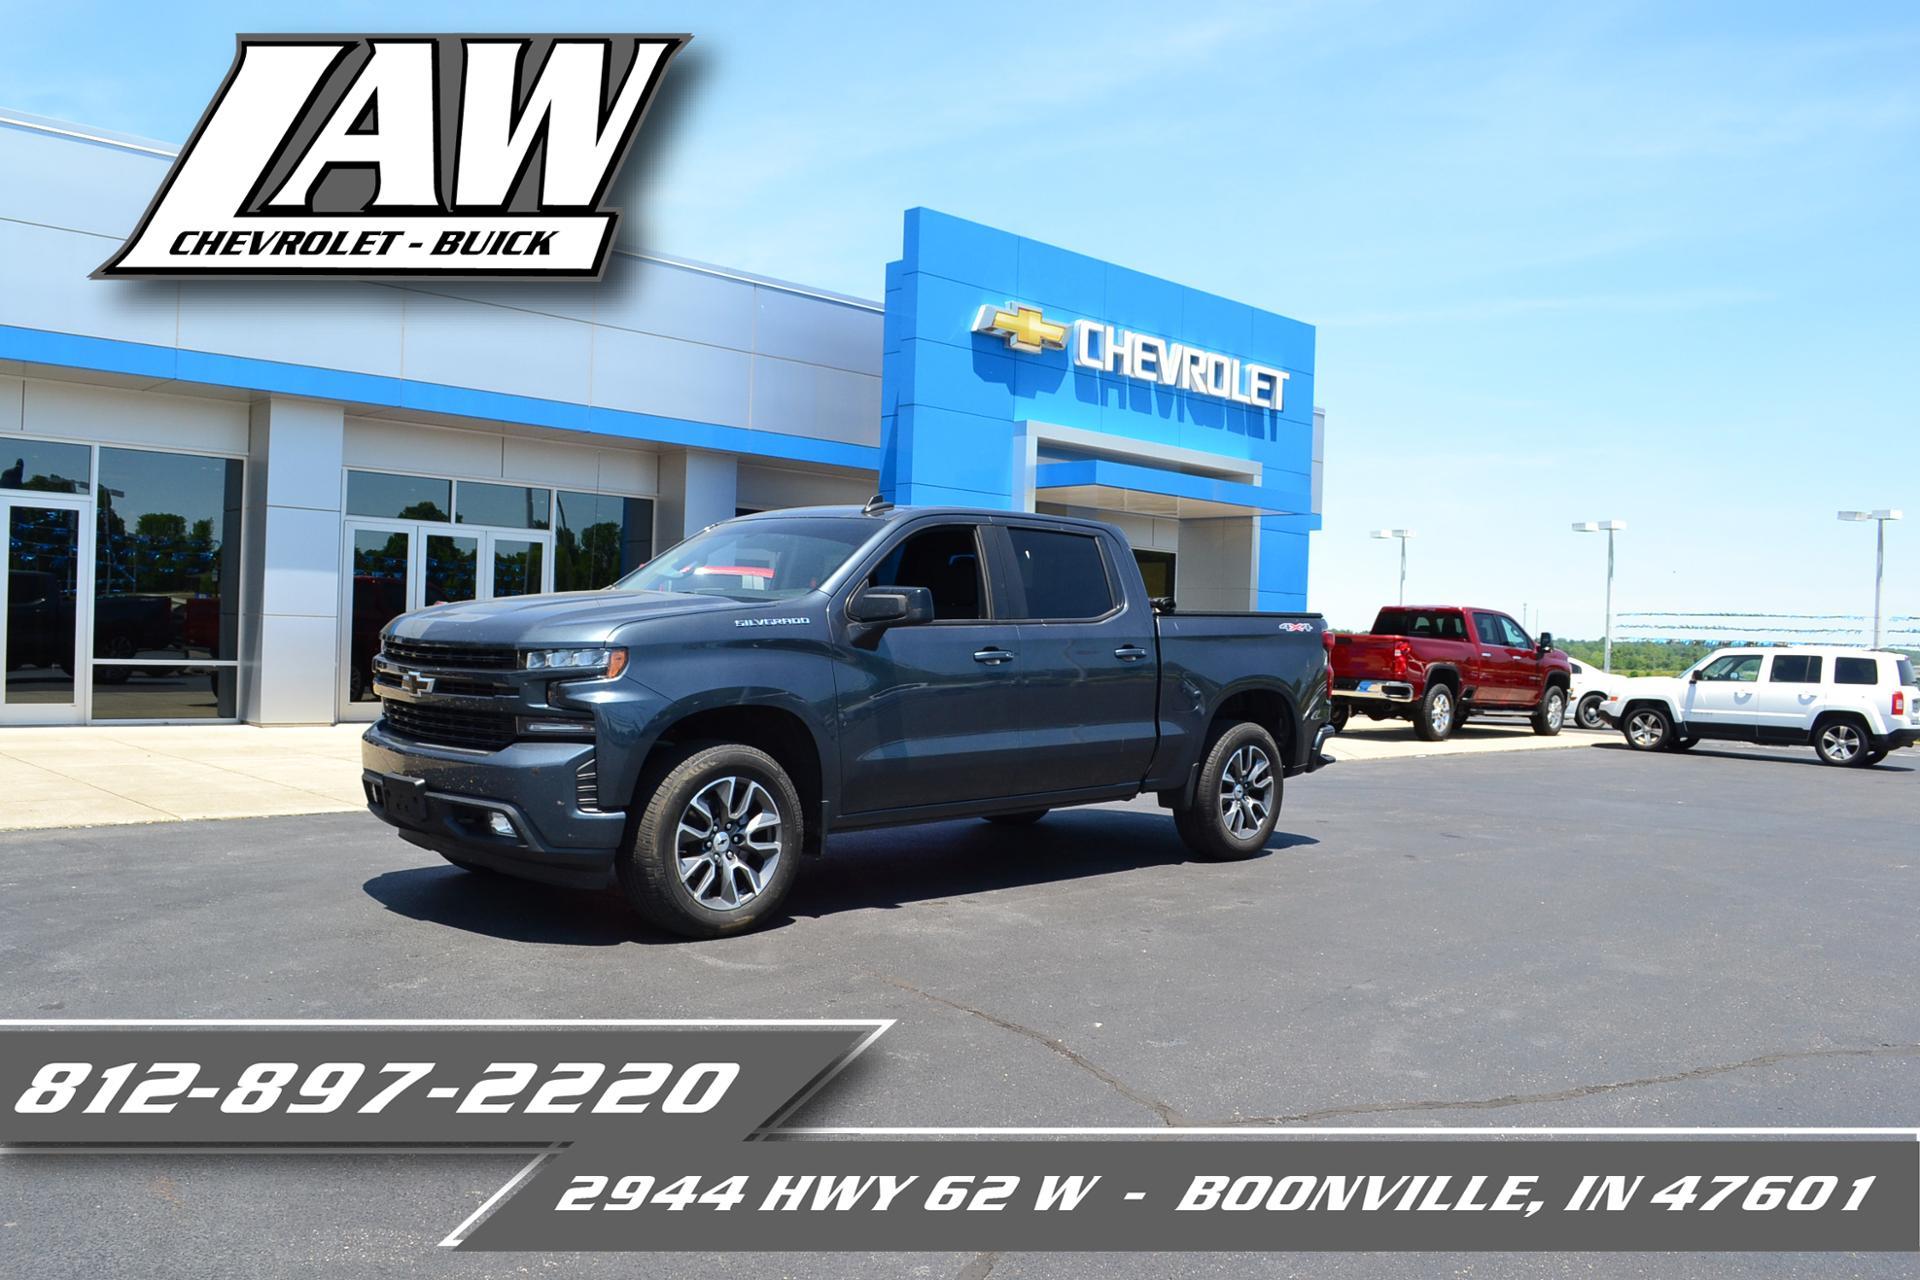 2019 Chevrolet Silverado 1500 Vehicle Photo in Boonville, IN 47601